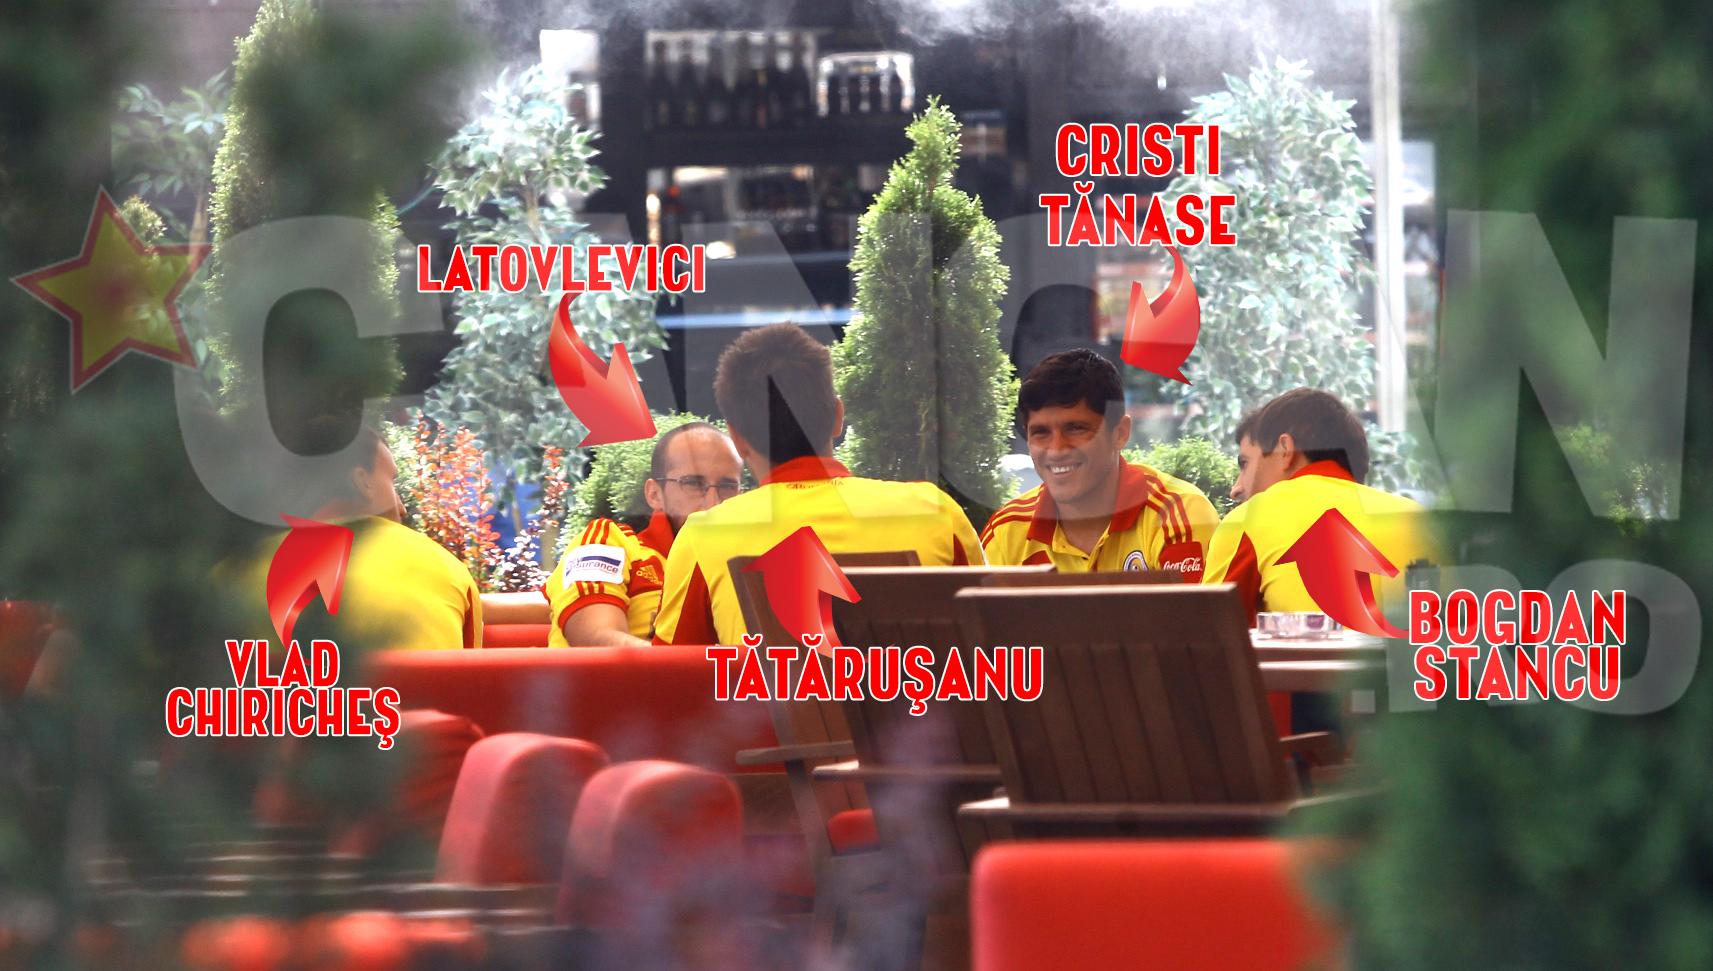 """Nucleul"" Stelei – Tanase, Latovlevici, Tatarusanu, Chiriches si Pintilii – l-a ""adoptat"" pe fostul golgheter al ros-albastrilor, Bogdan Stancu"